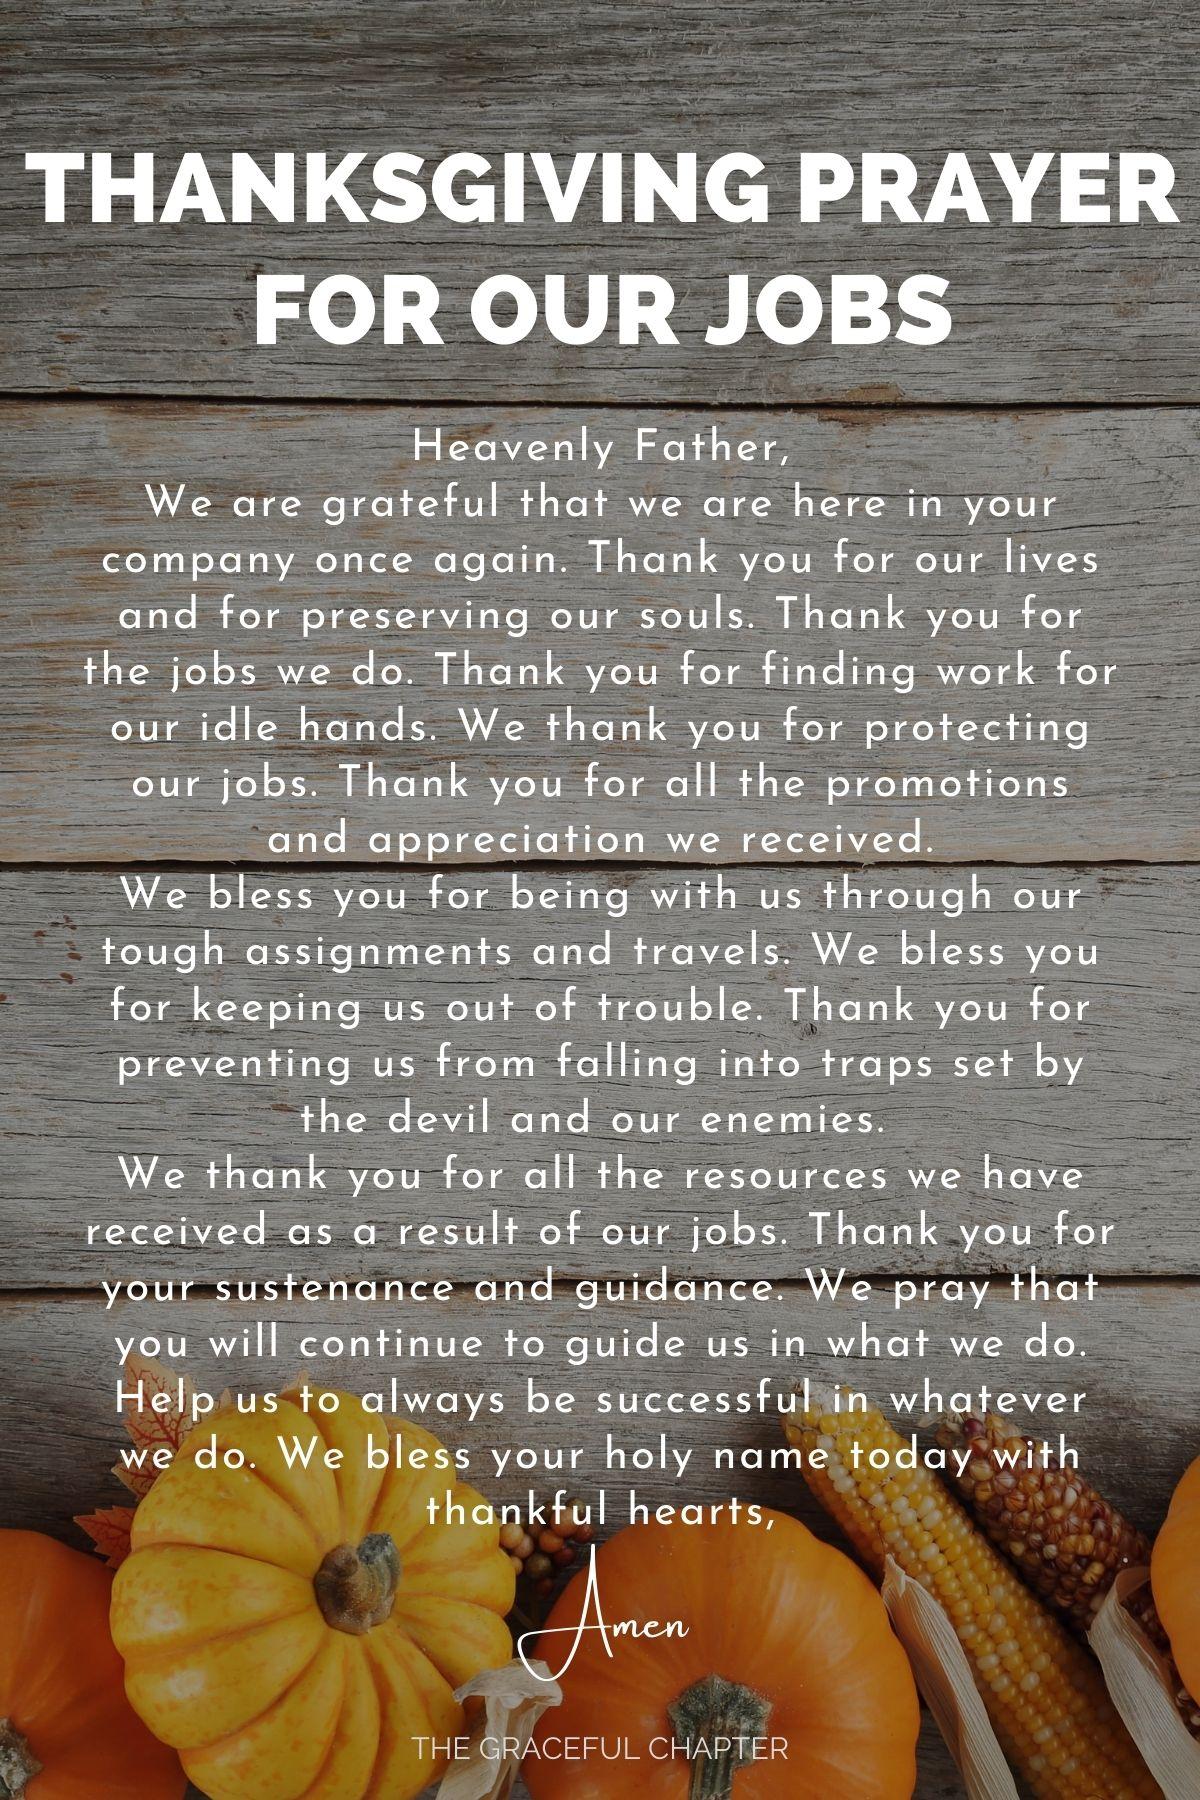 Thanksgiving prayer for our jobs